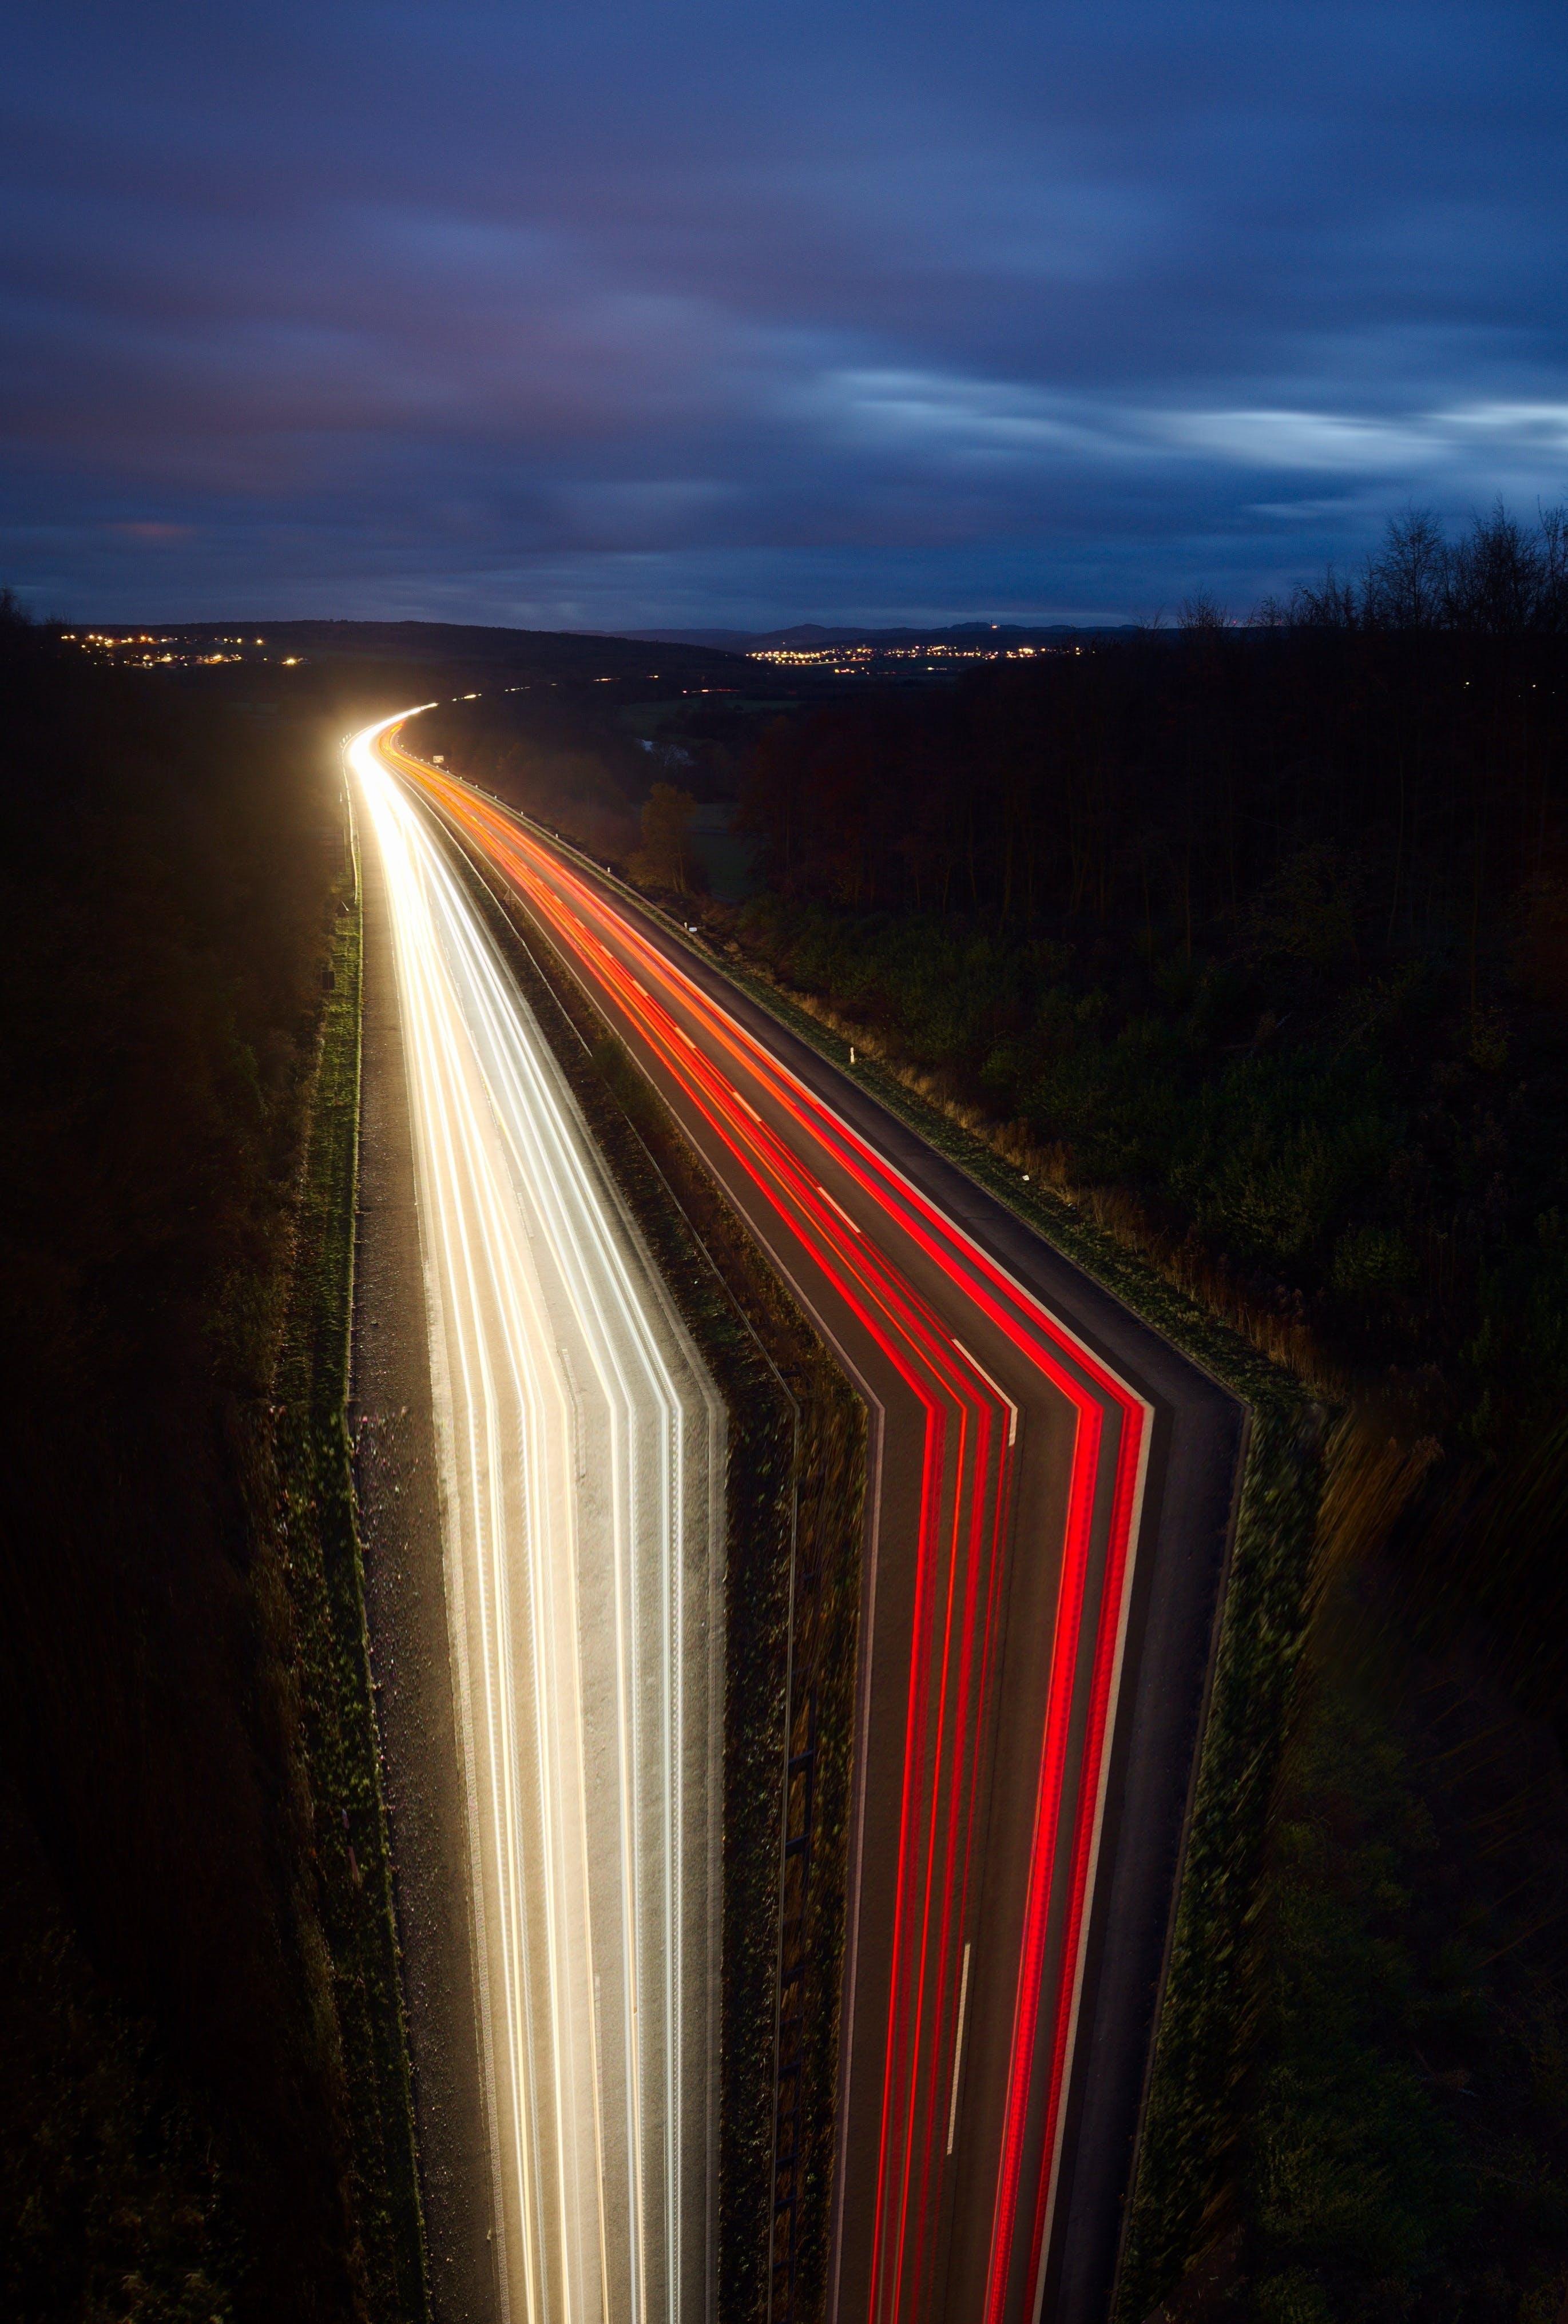 Free stock photo of road, traffic, vehicles, travel